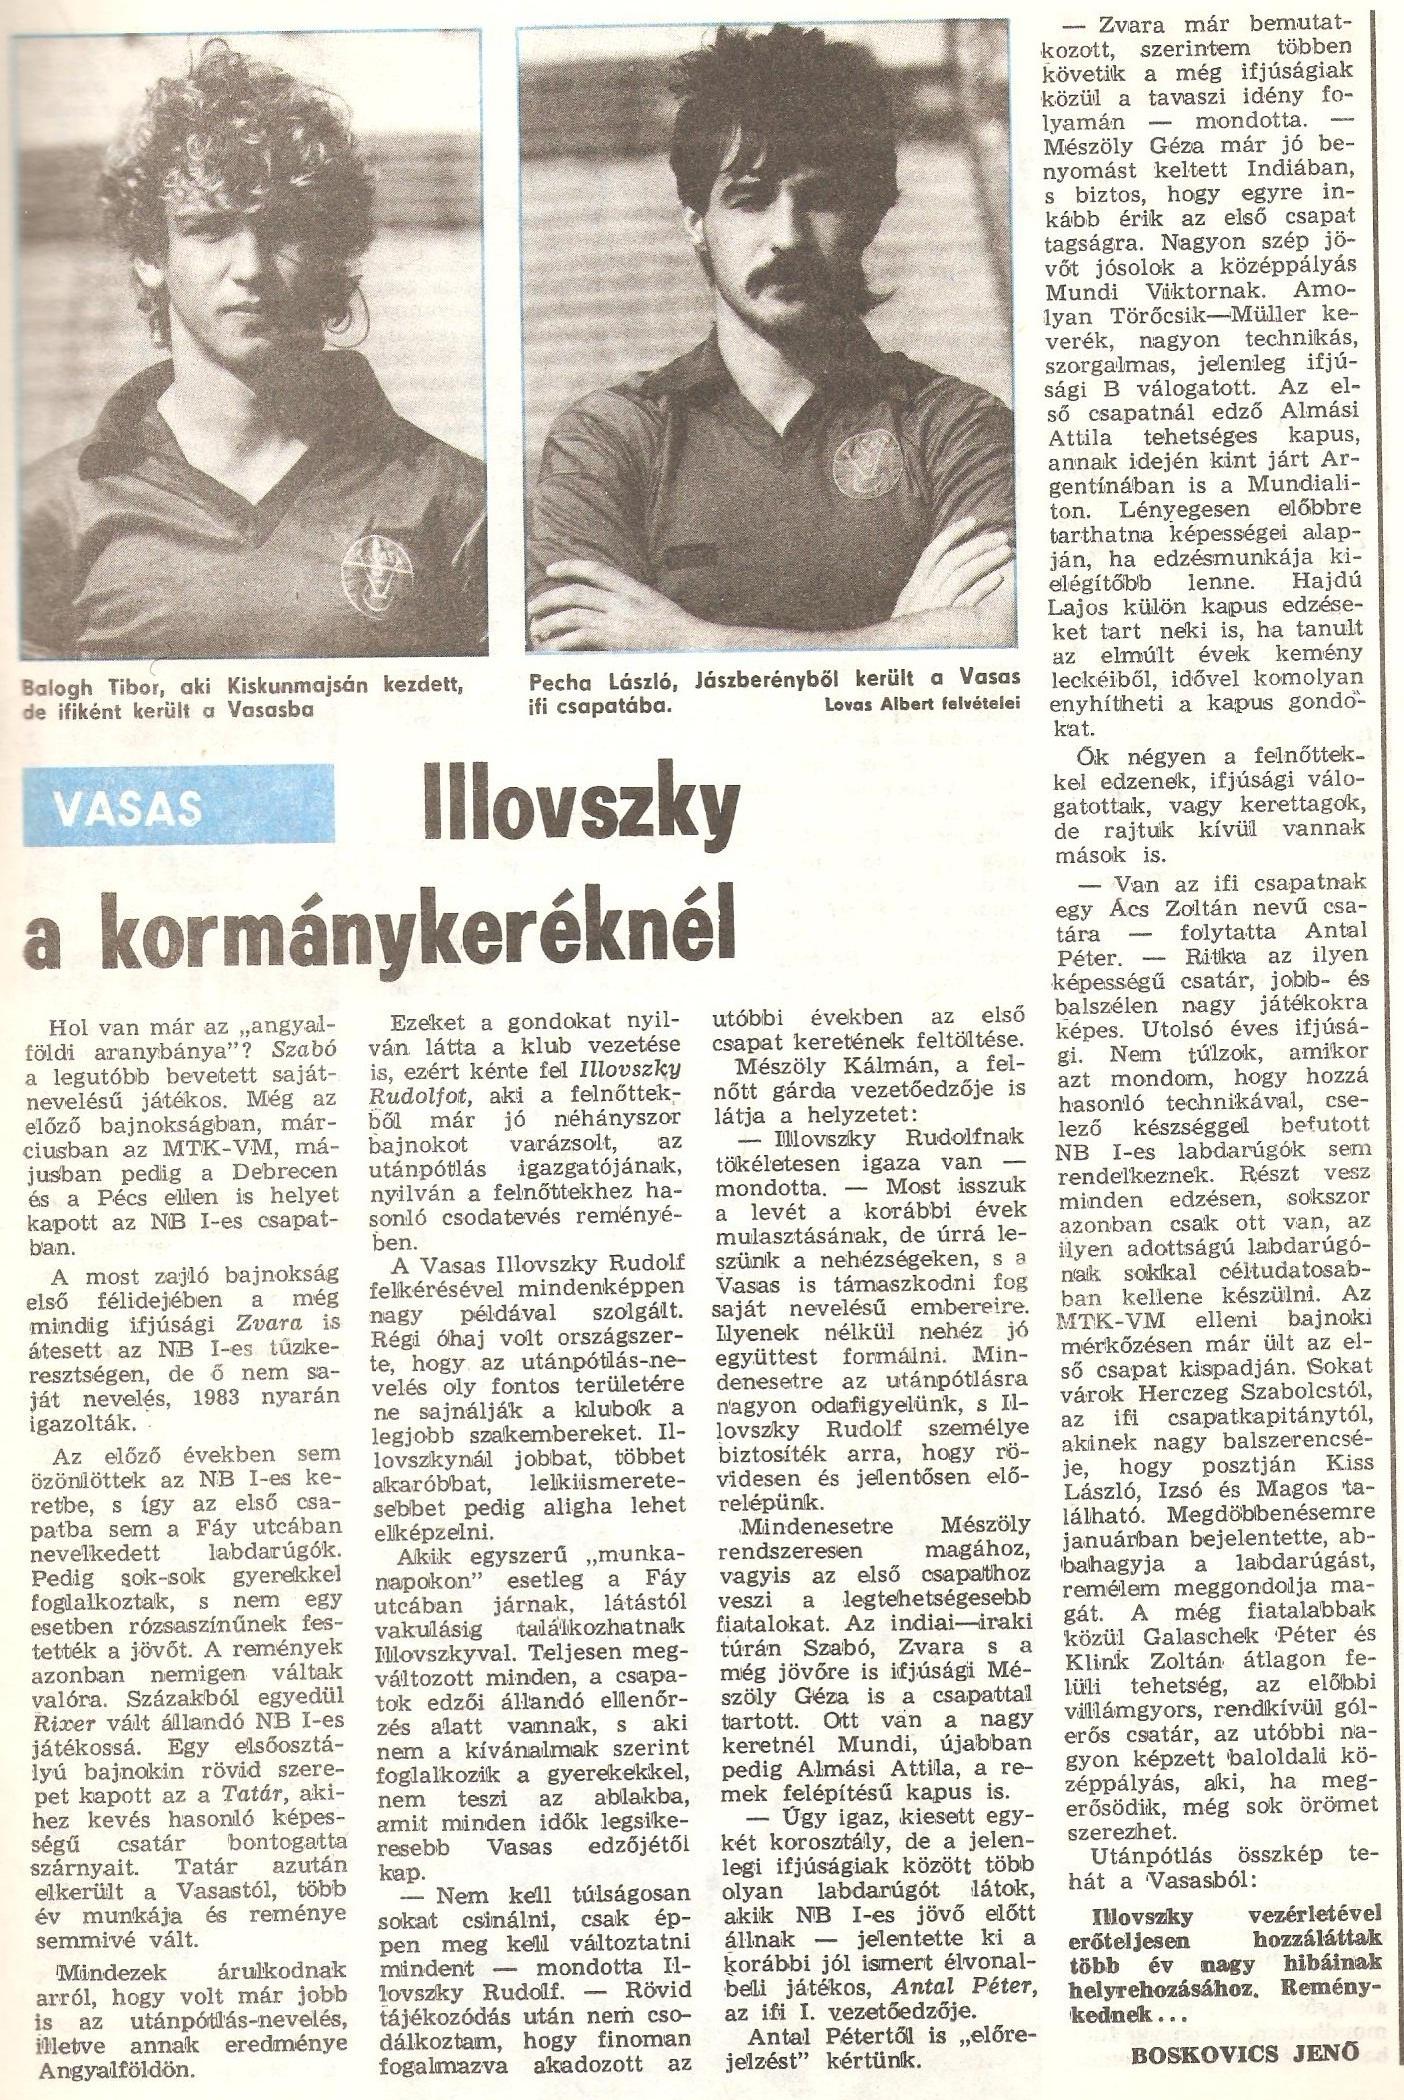 Idokapszula_1983-84_Teliszunet_bevetes_elott_Vasas.jpg